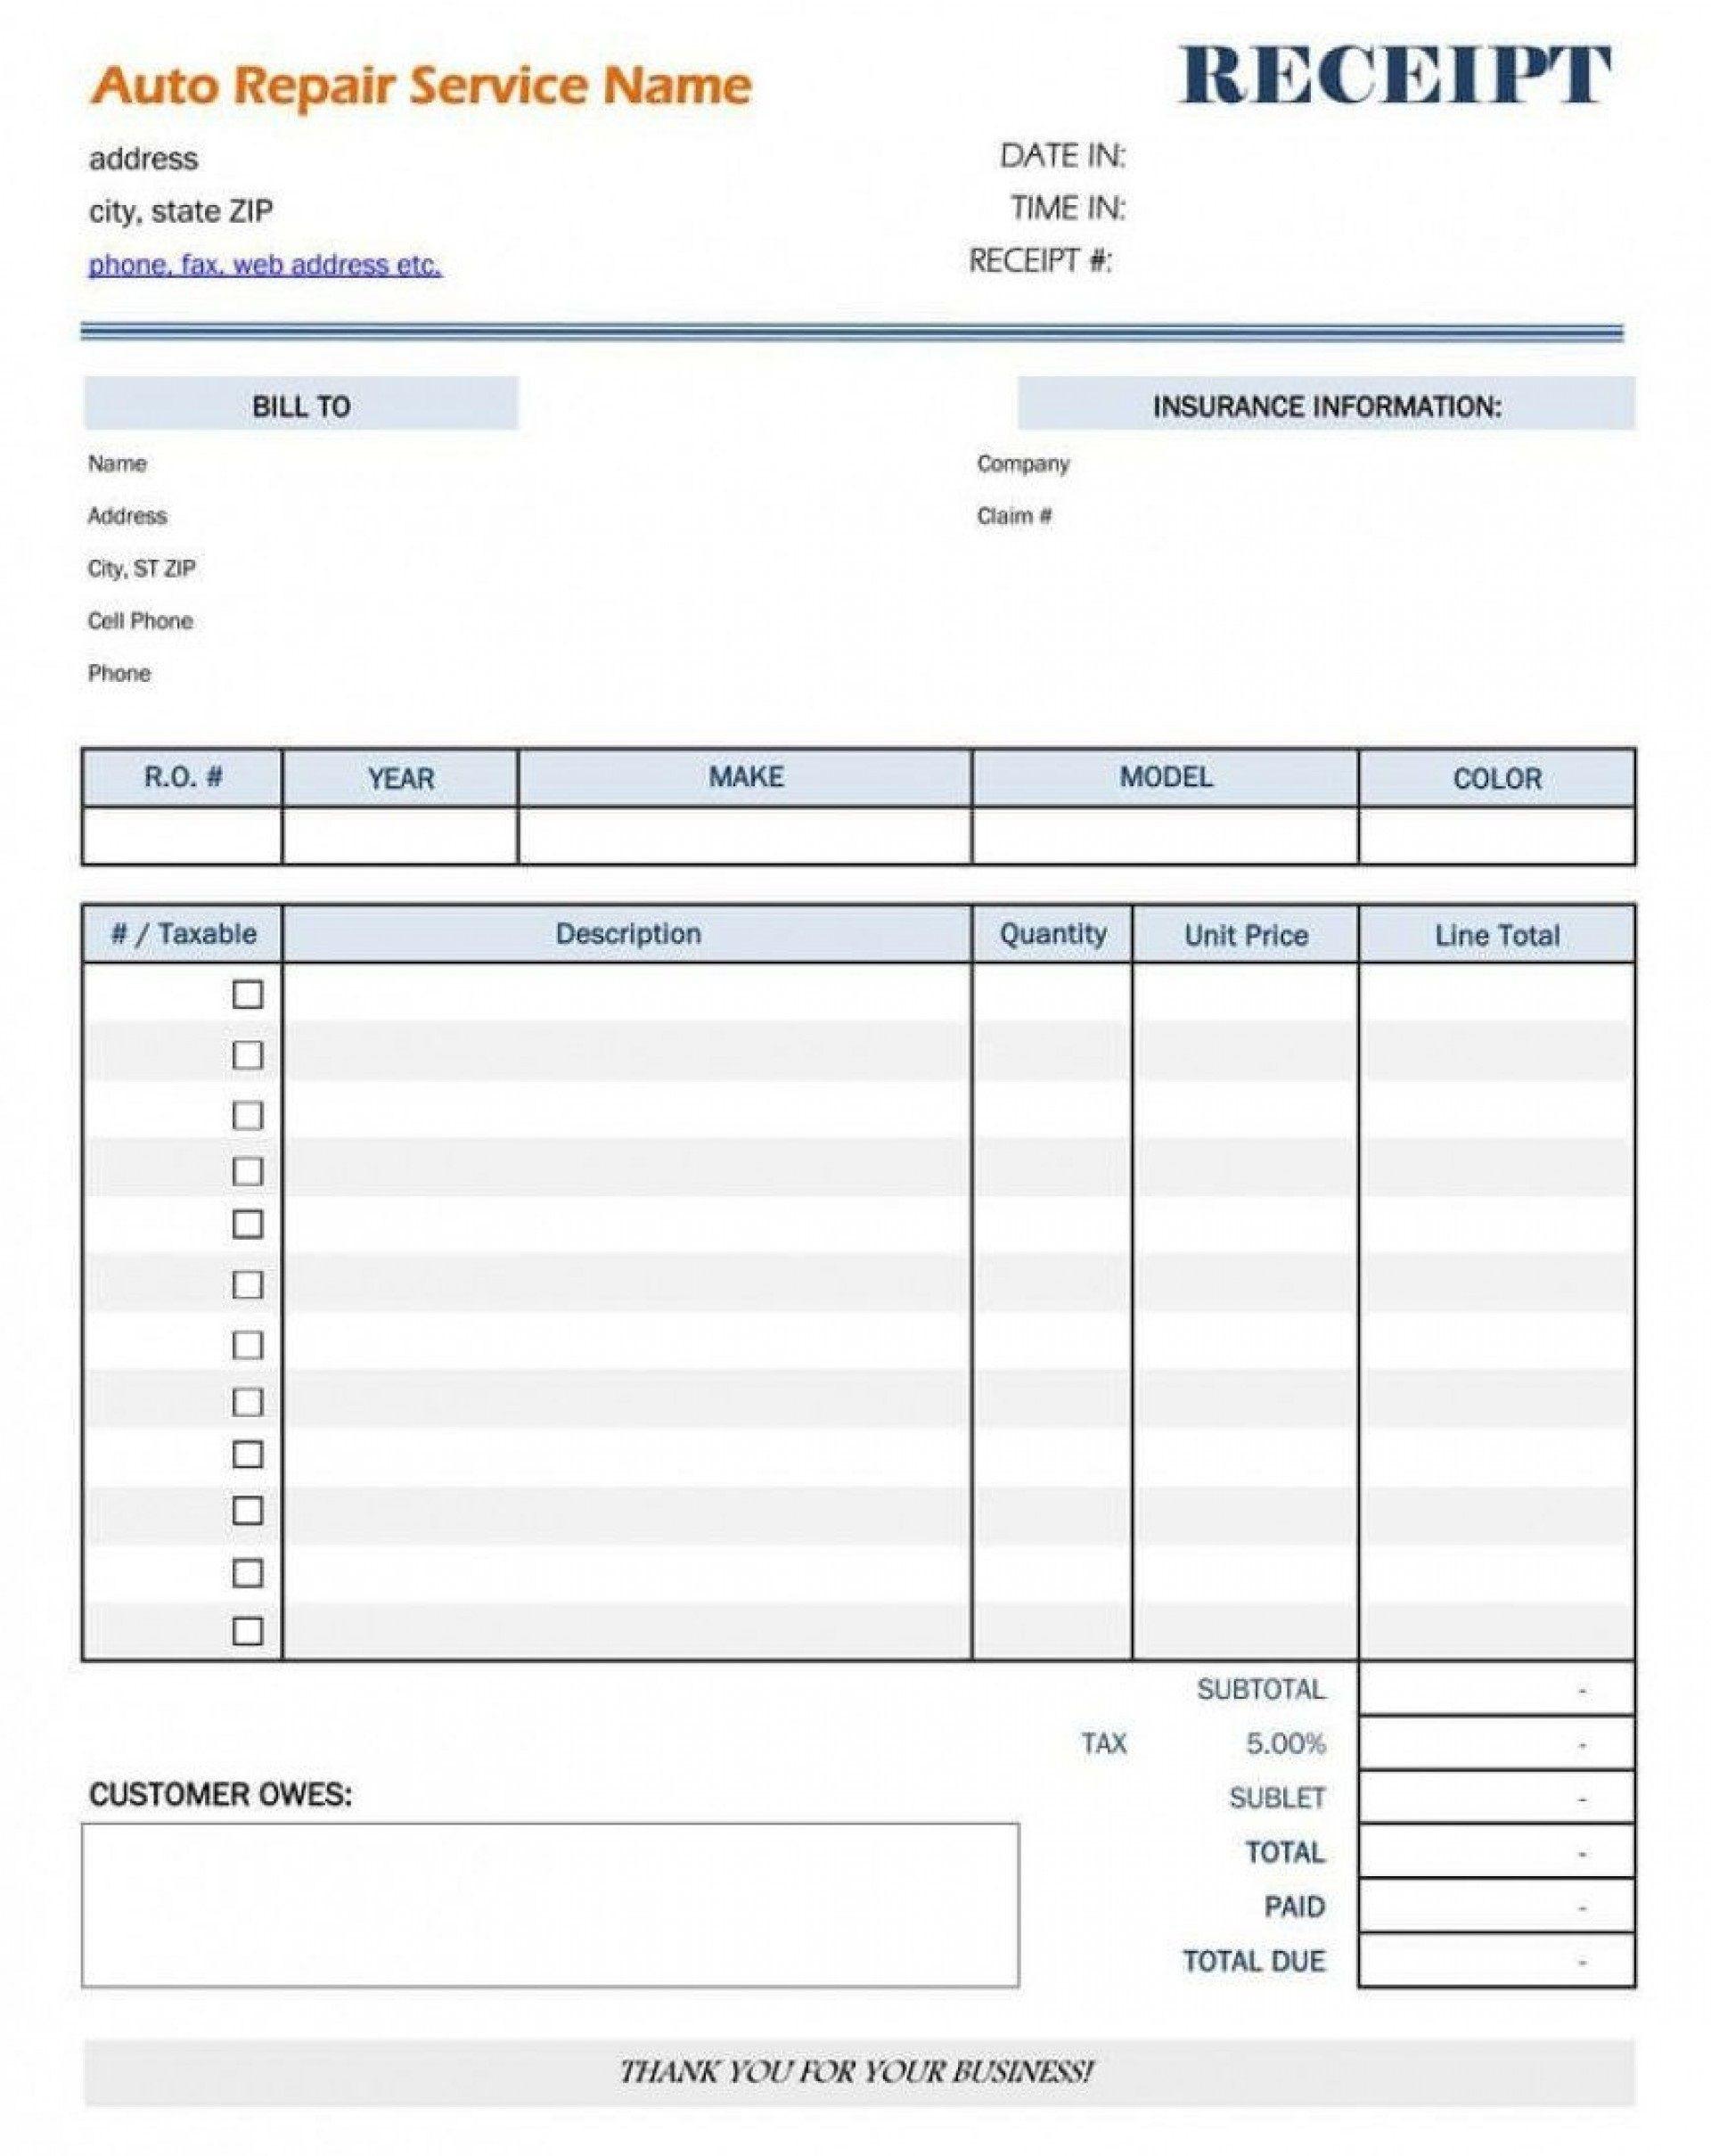 006 Astounding Auto Repair Invoice Template Free Inspiration  Excel Printable Pdf1920